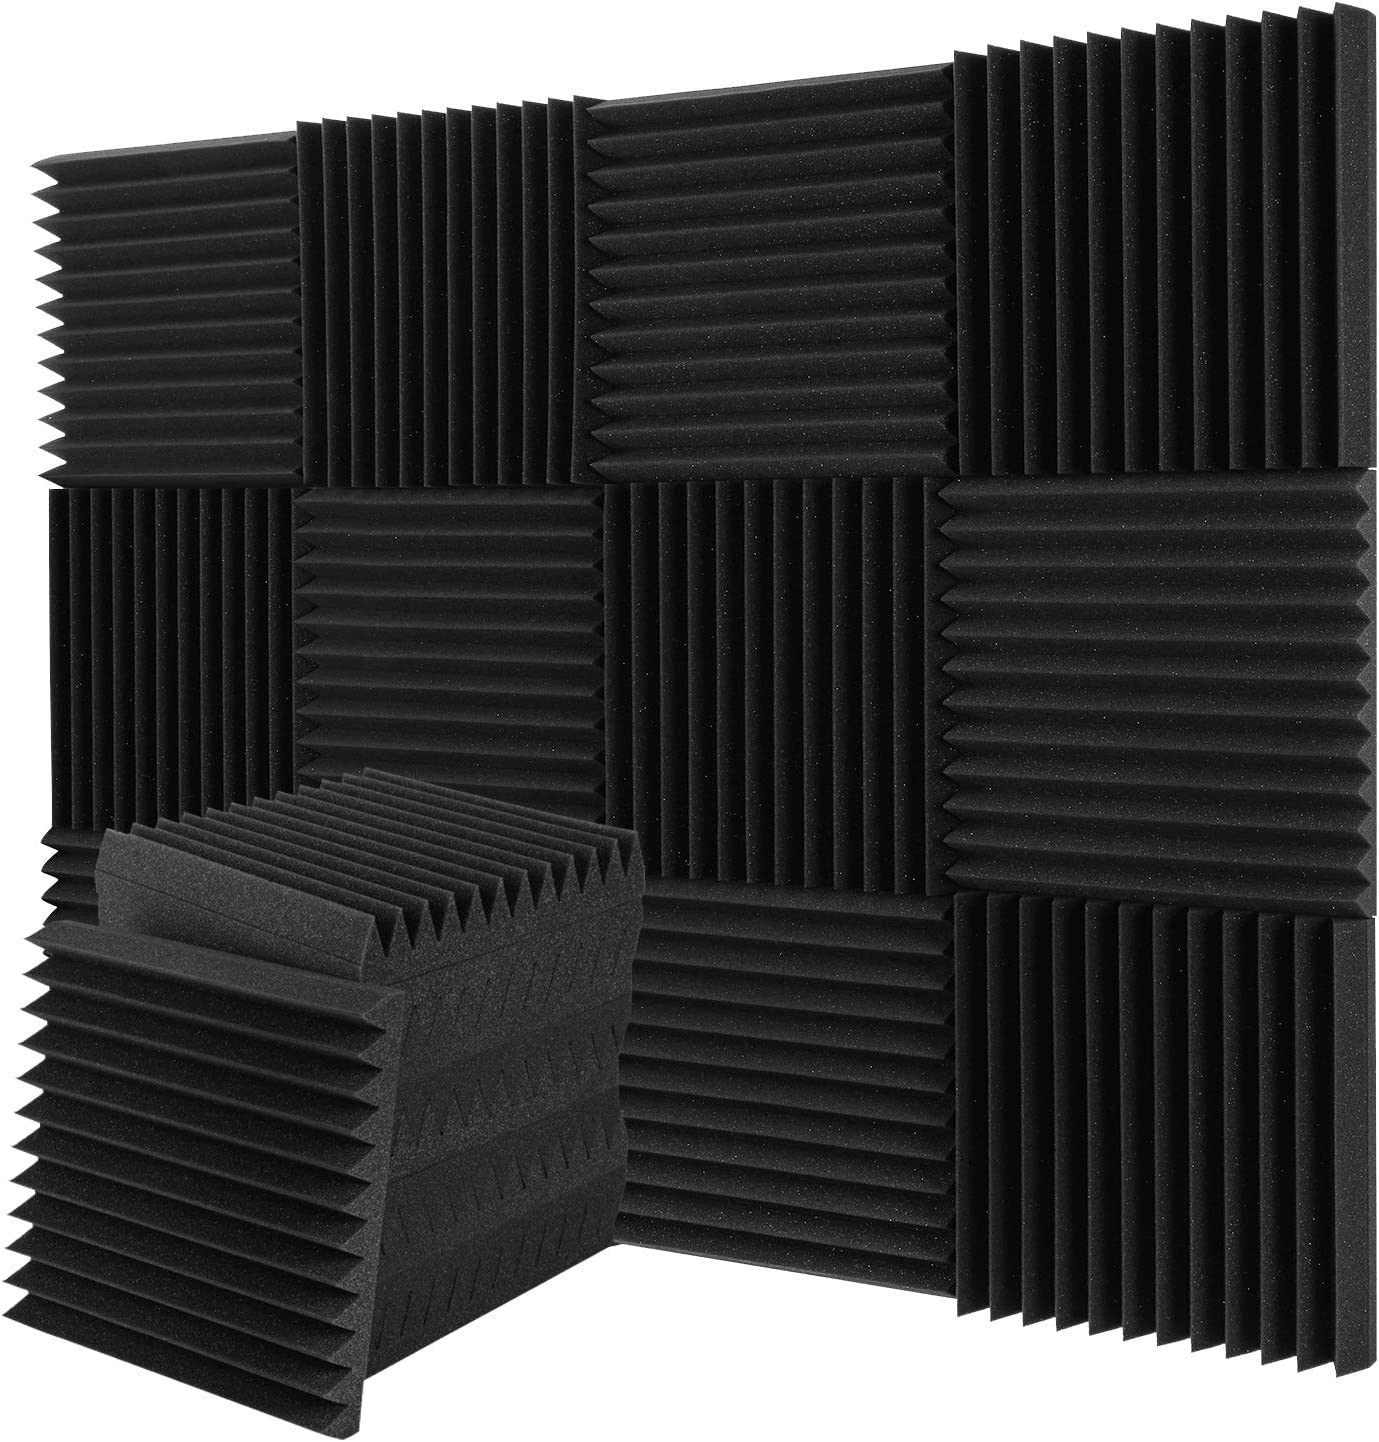 Donner Espuma Acústica, 12 Planchas, Aislante Acústico, Paneles Acústicos para Estudios, Estudios de Grabación, Oficinas, Sala Acústica, Insonorizacion acustica pared, 30 * 30 * 5CM